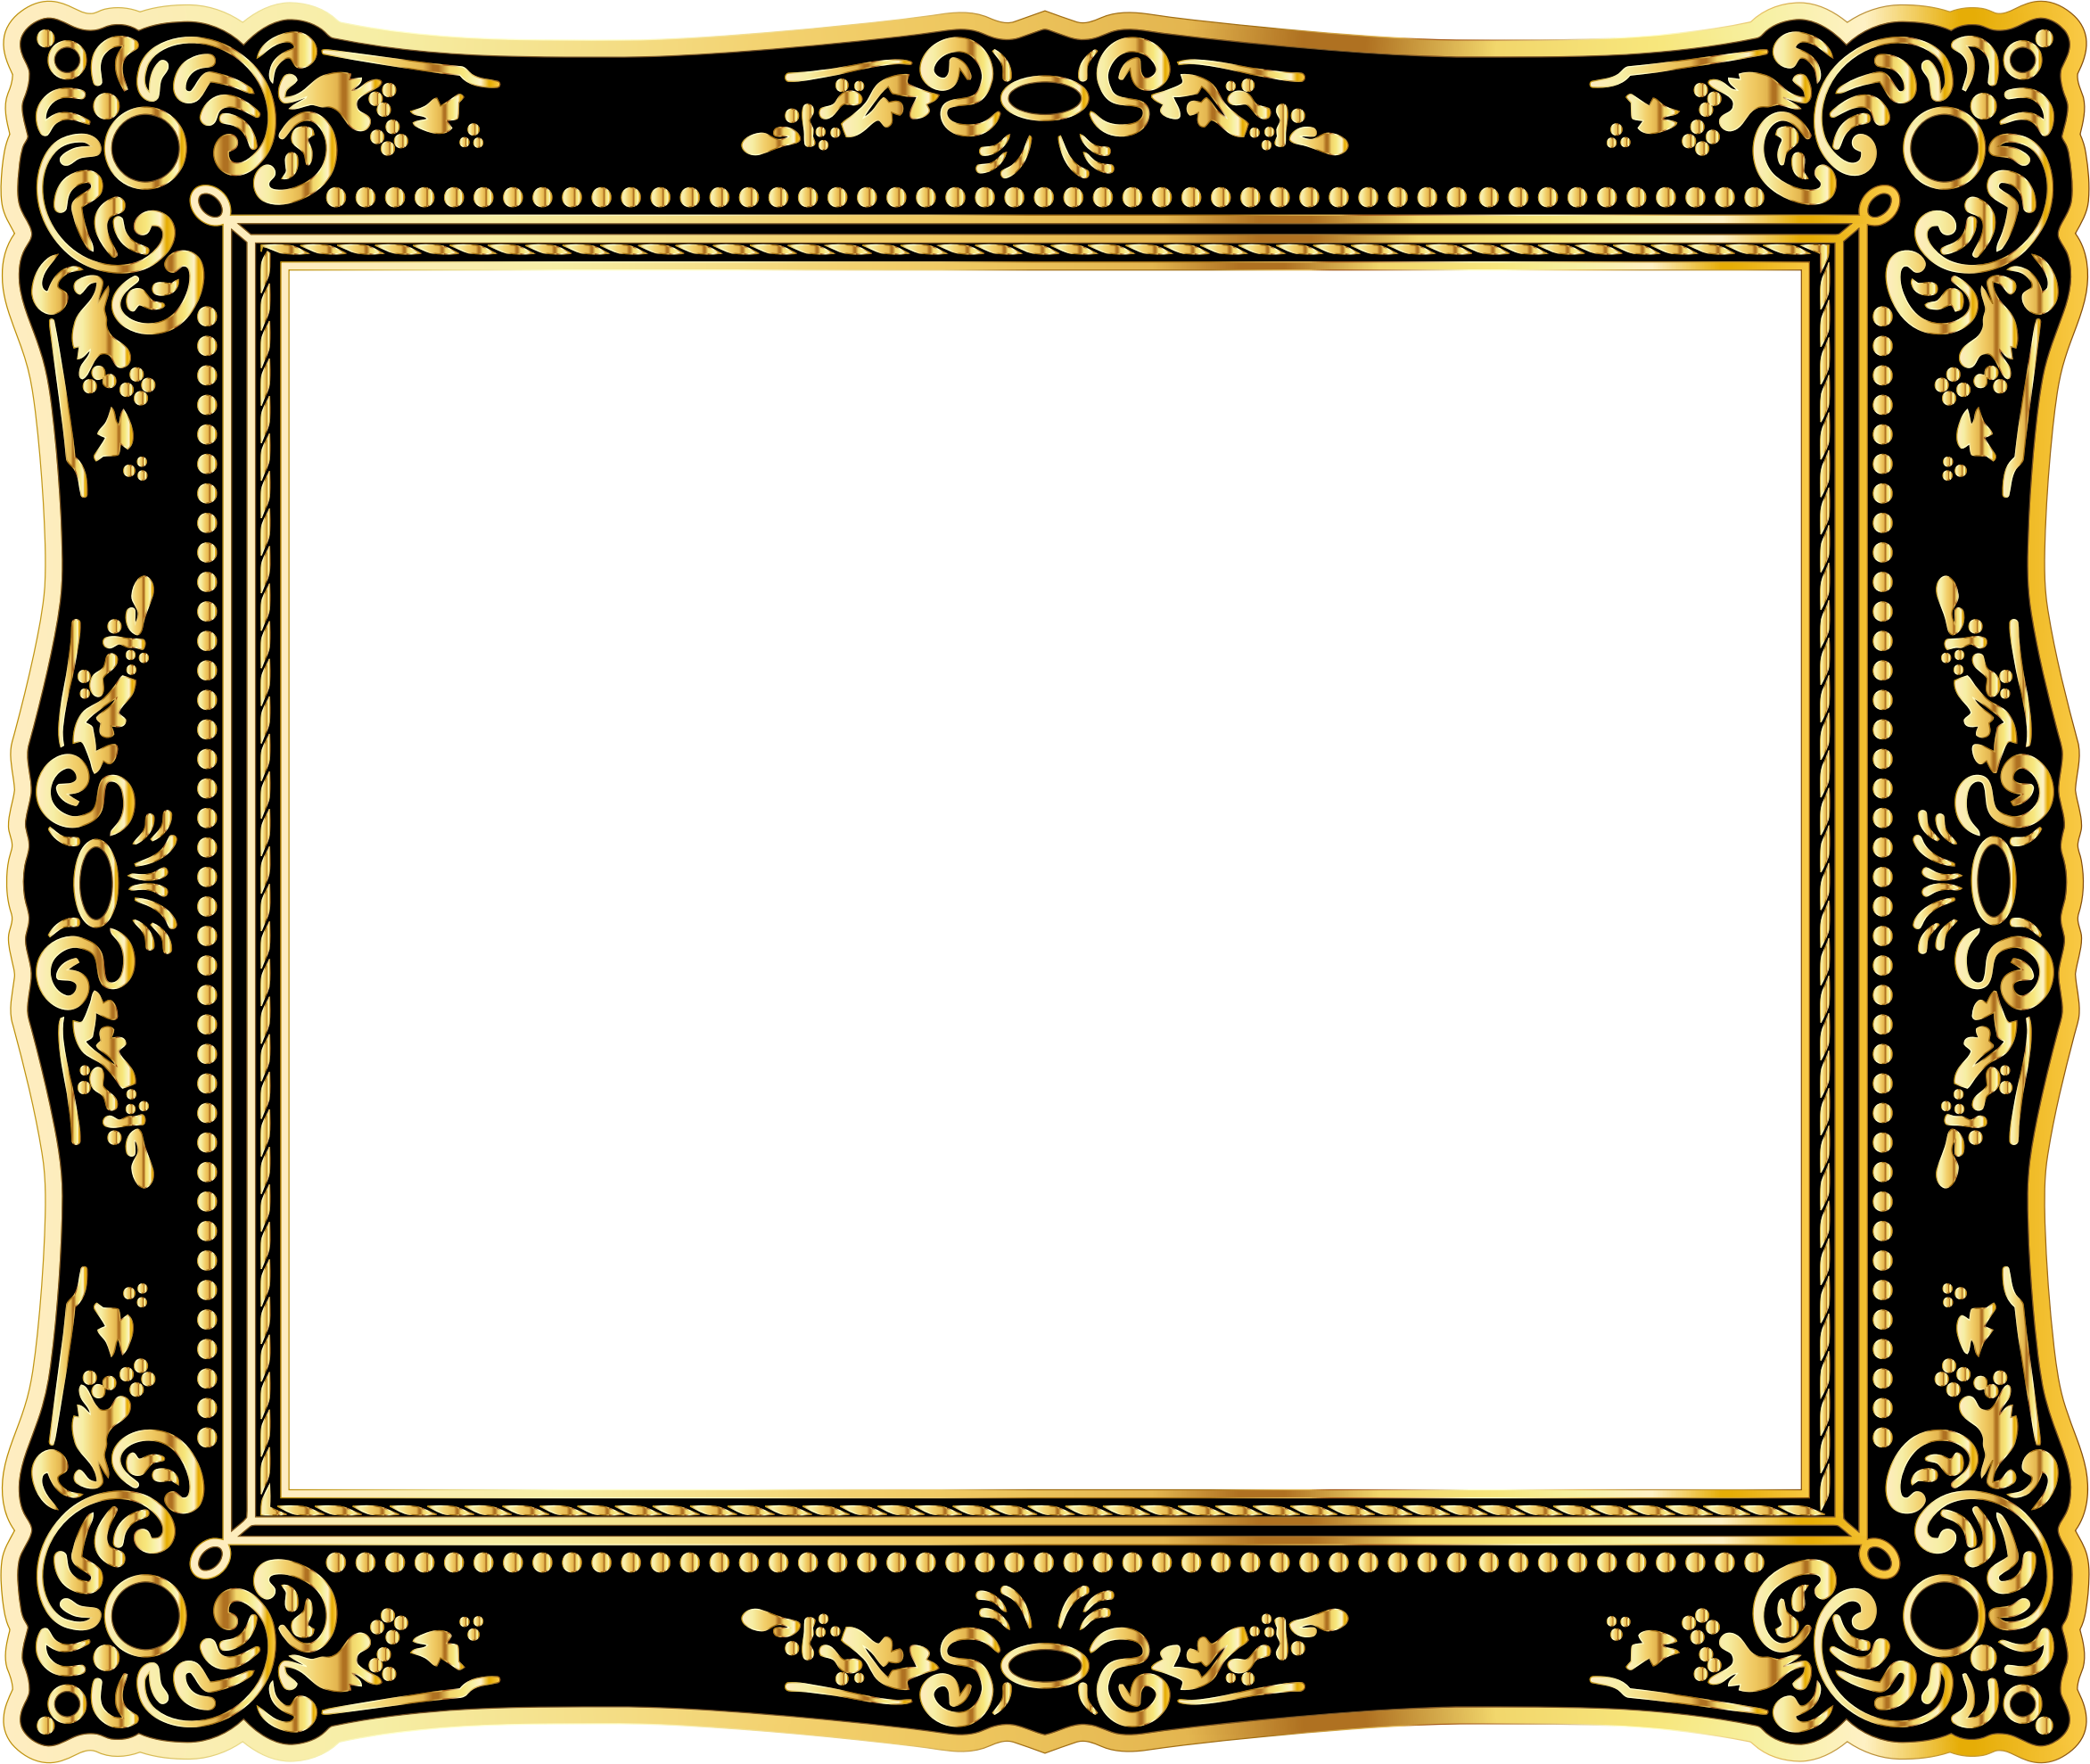 Clipart - Vintage Style Frame Gold